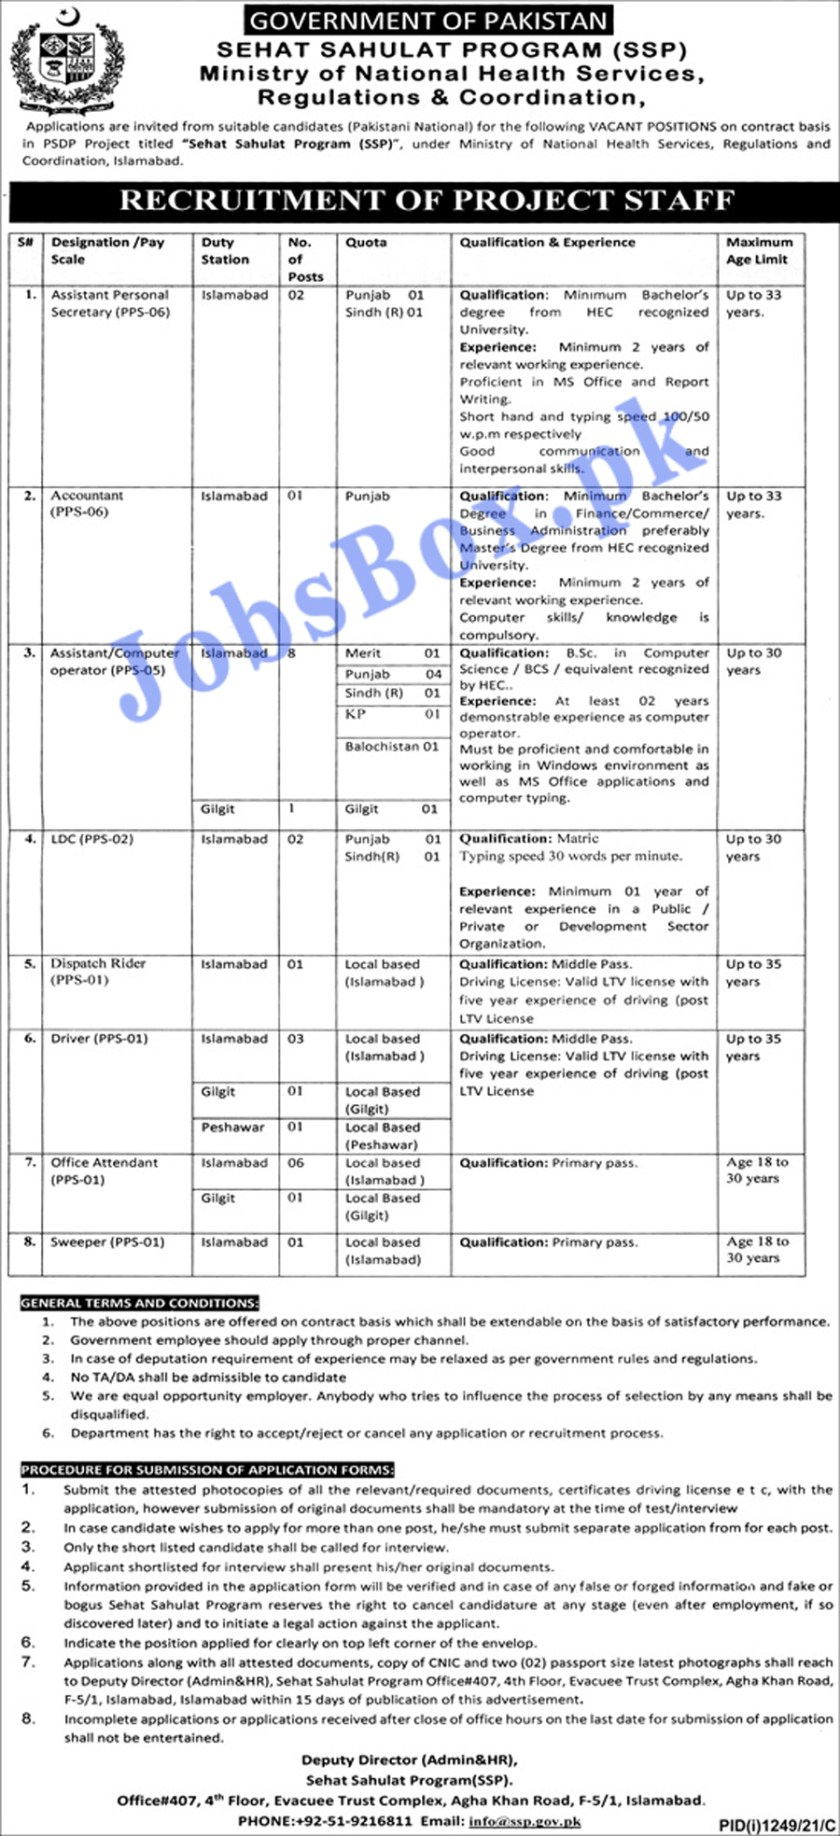 Sehat Sahulat Program SSP Jobs 2021 - Ministry of Health Services Jobs